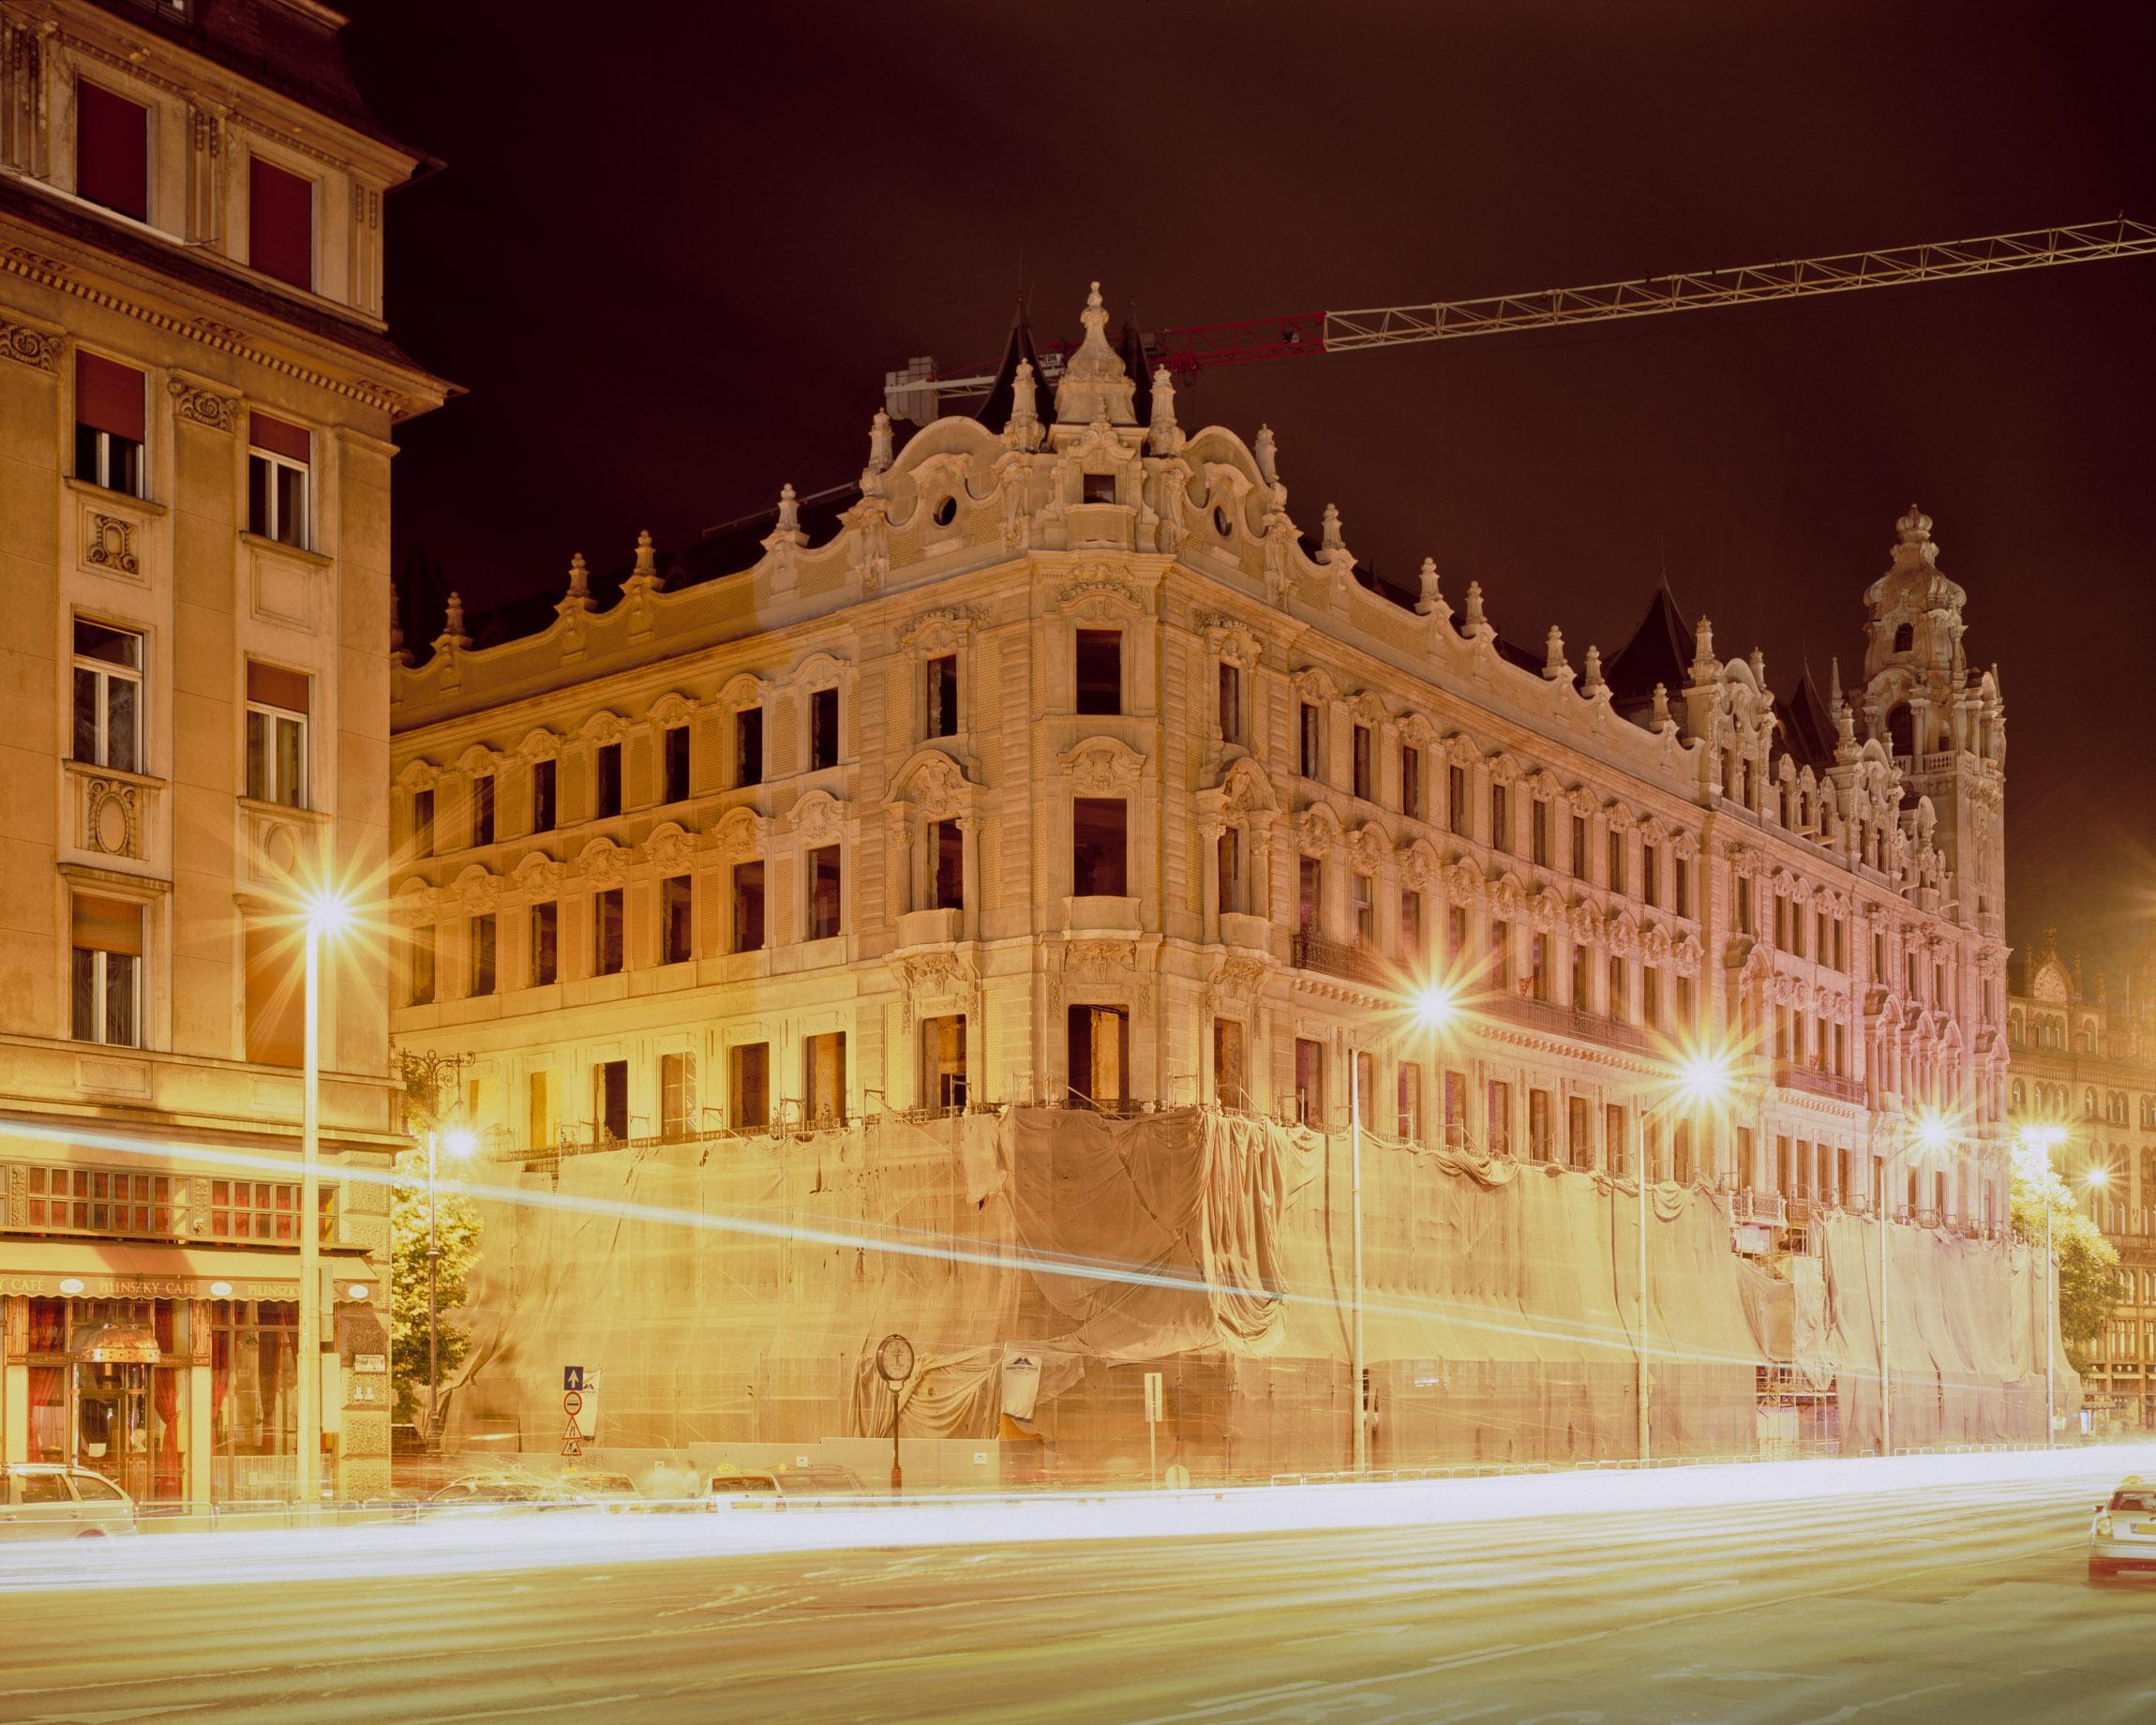 Szabad sajtó út / Váci utica, Budapest